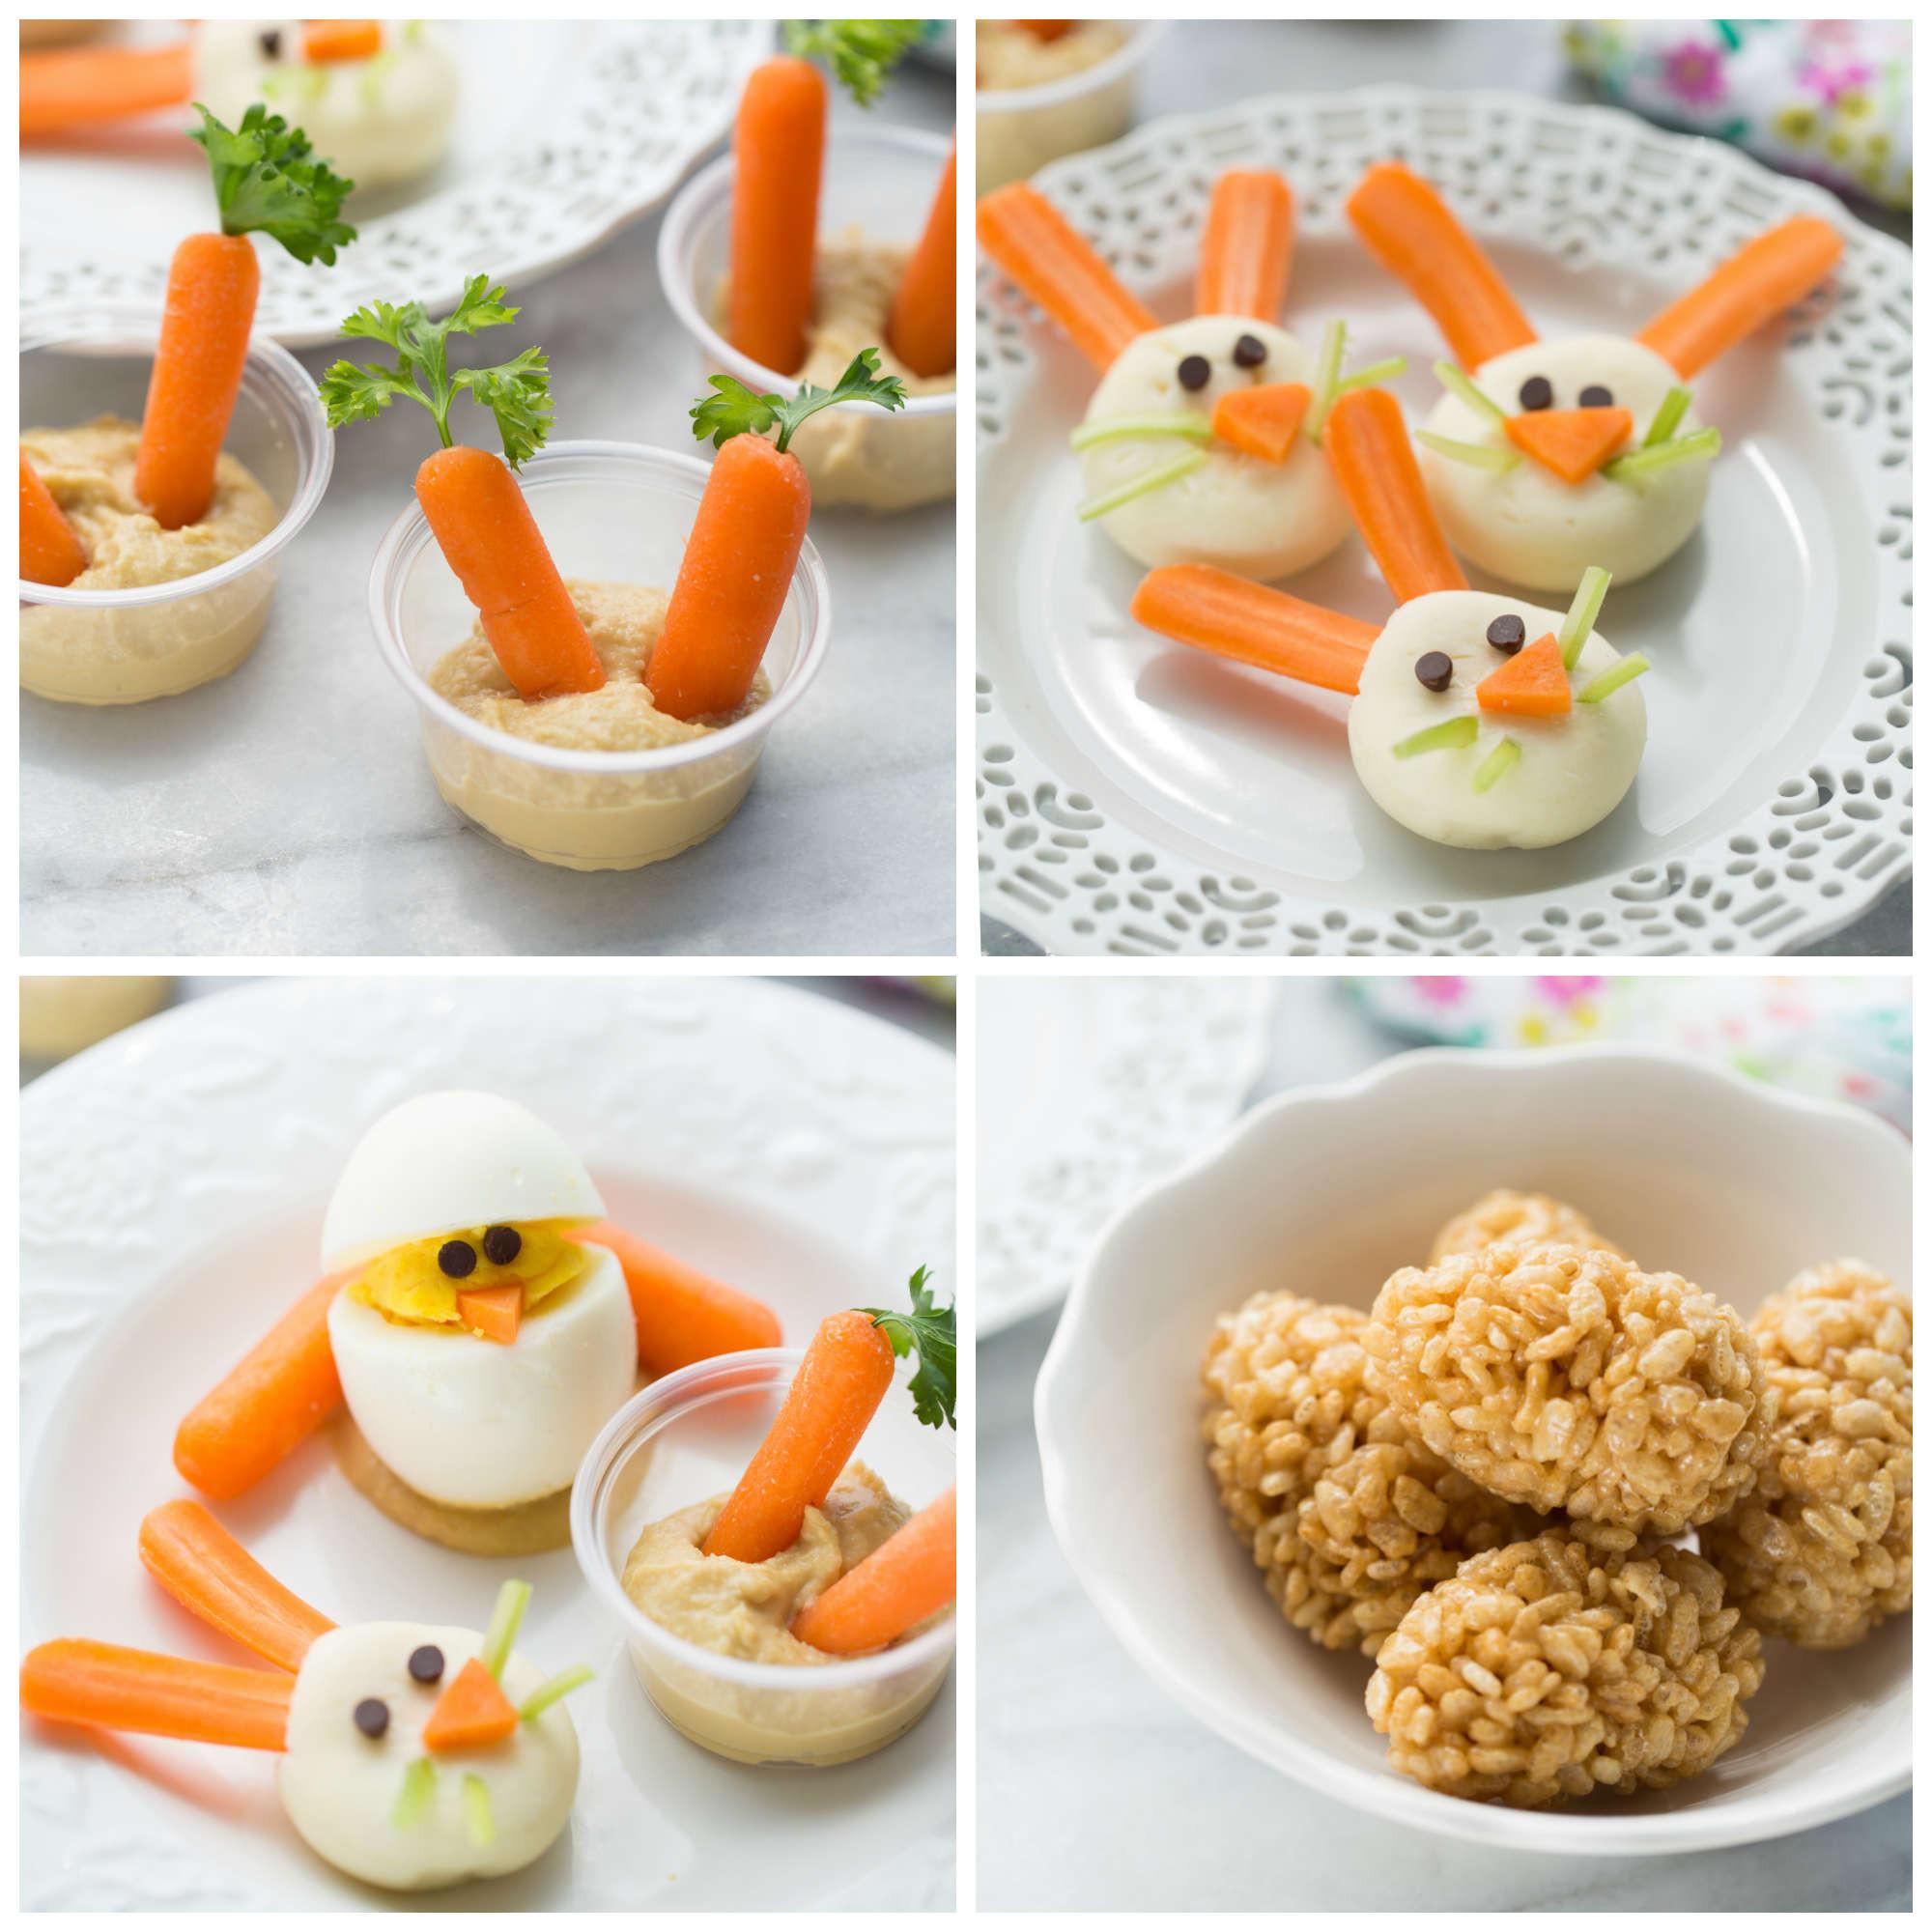 Kids Healthy Snacks  4 Healthy Kids Easter Snacks Meaningful Eats